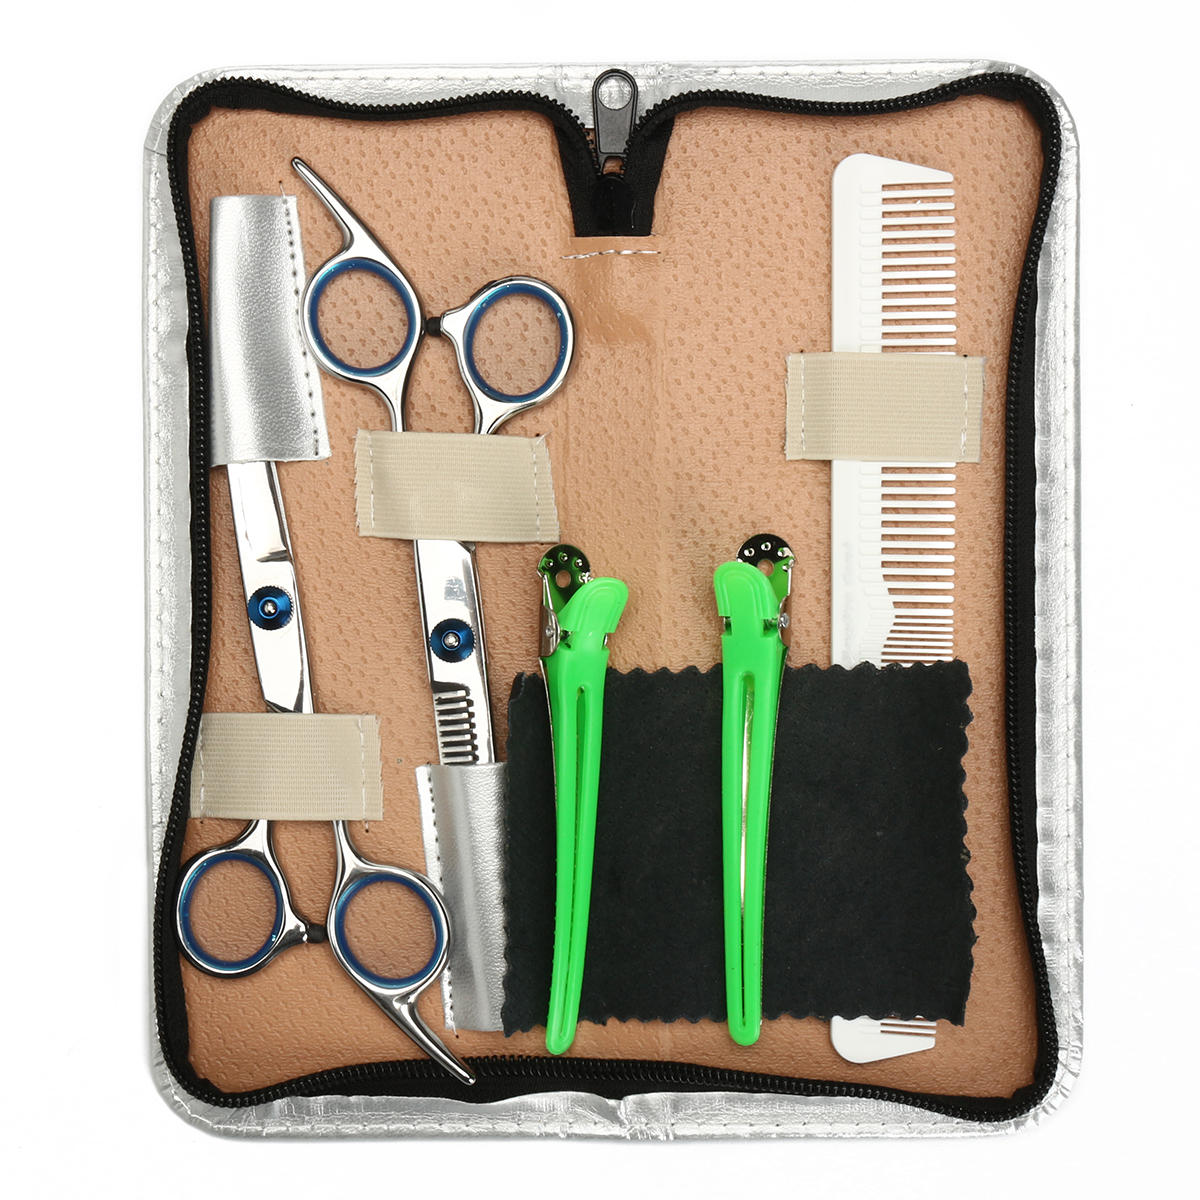 6 8 Inch Salon Hair Cutting Scissors Comb Clips Barber Kit